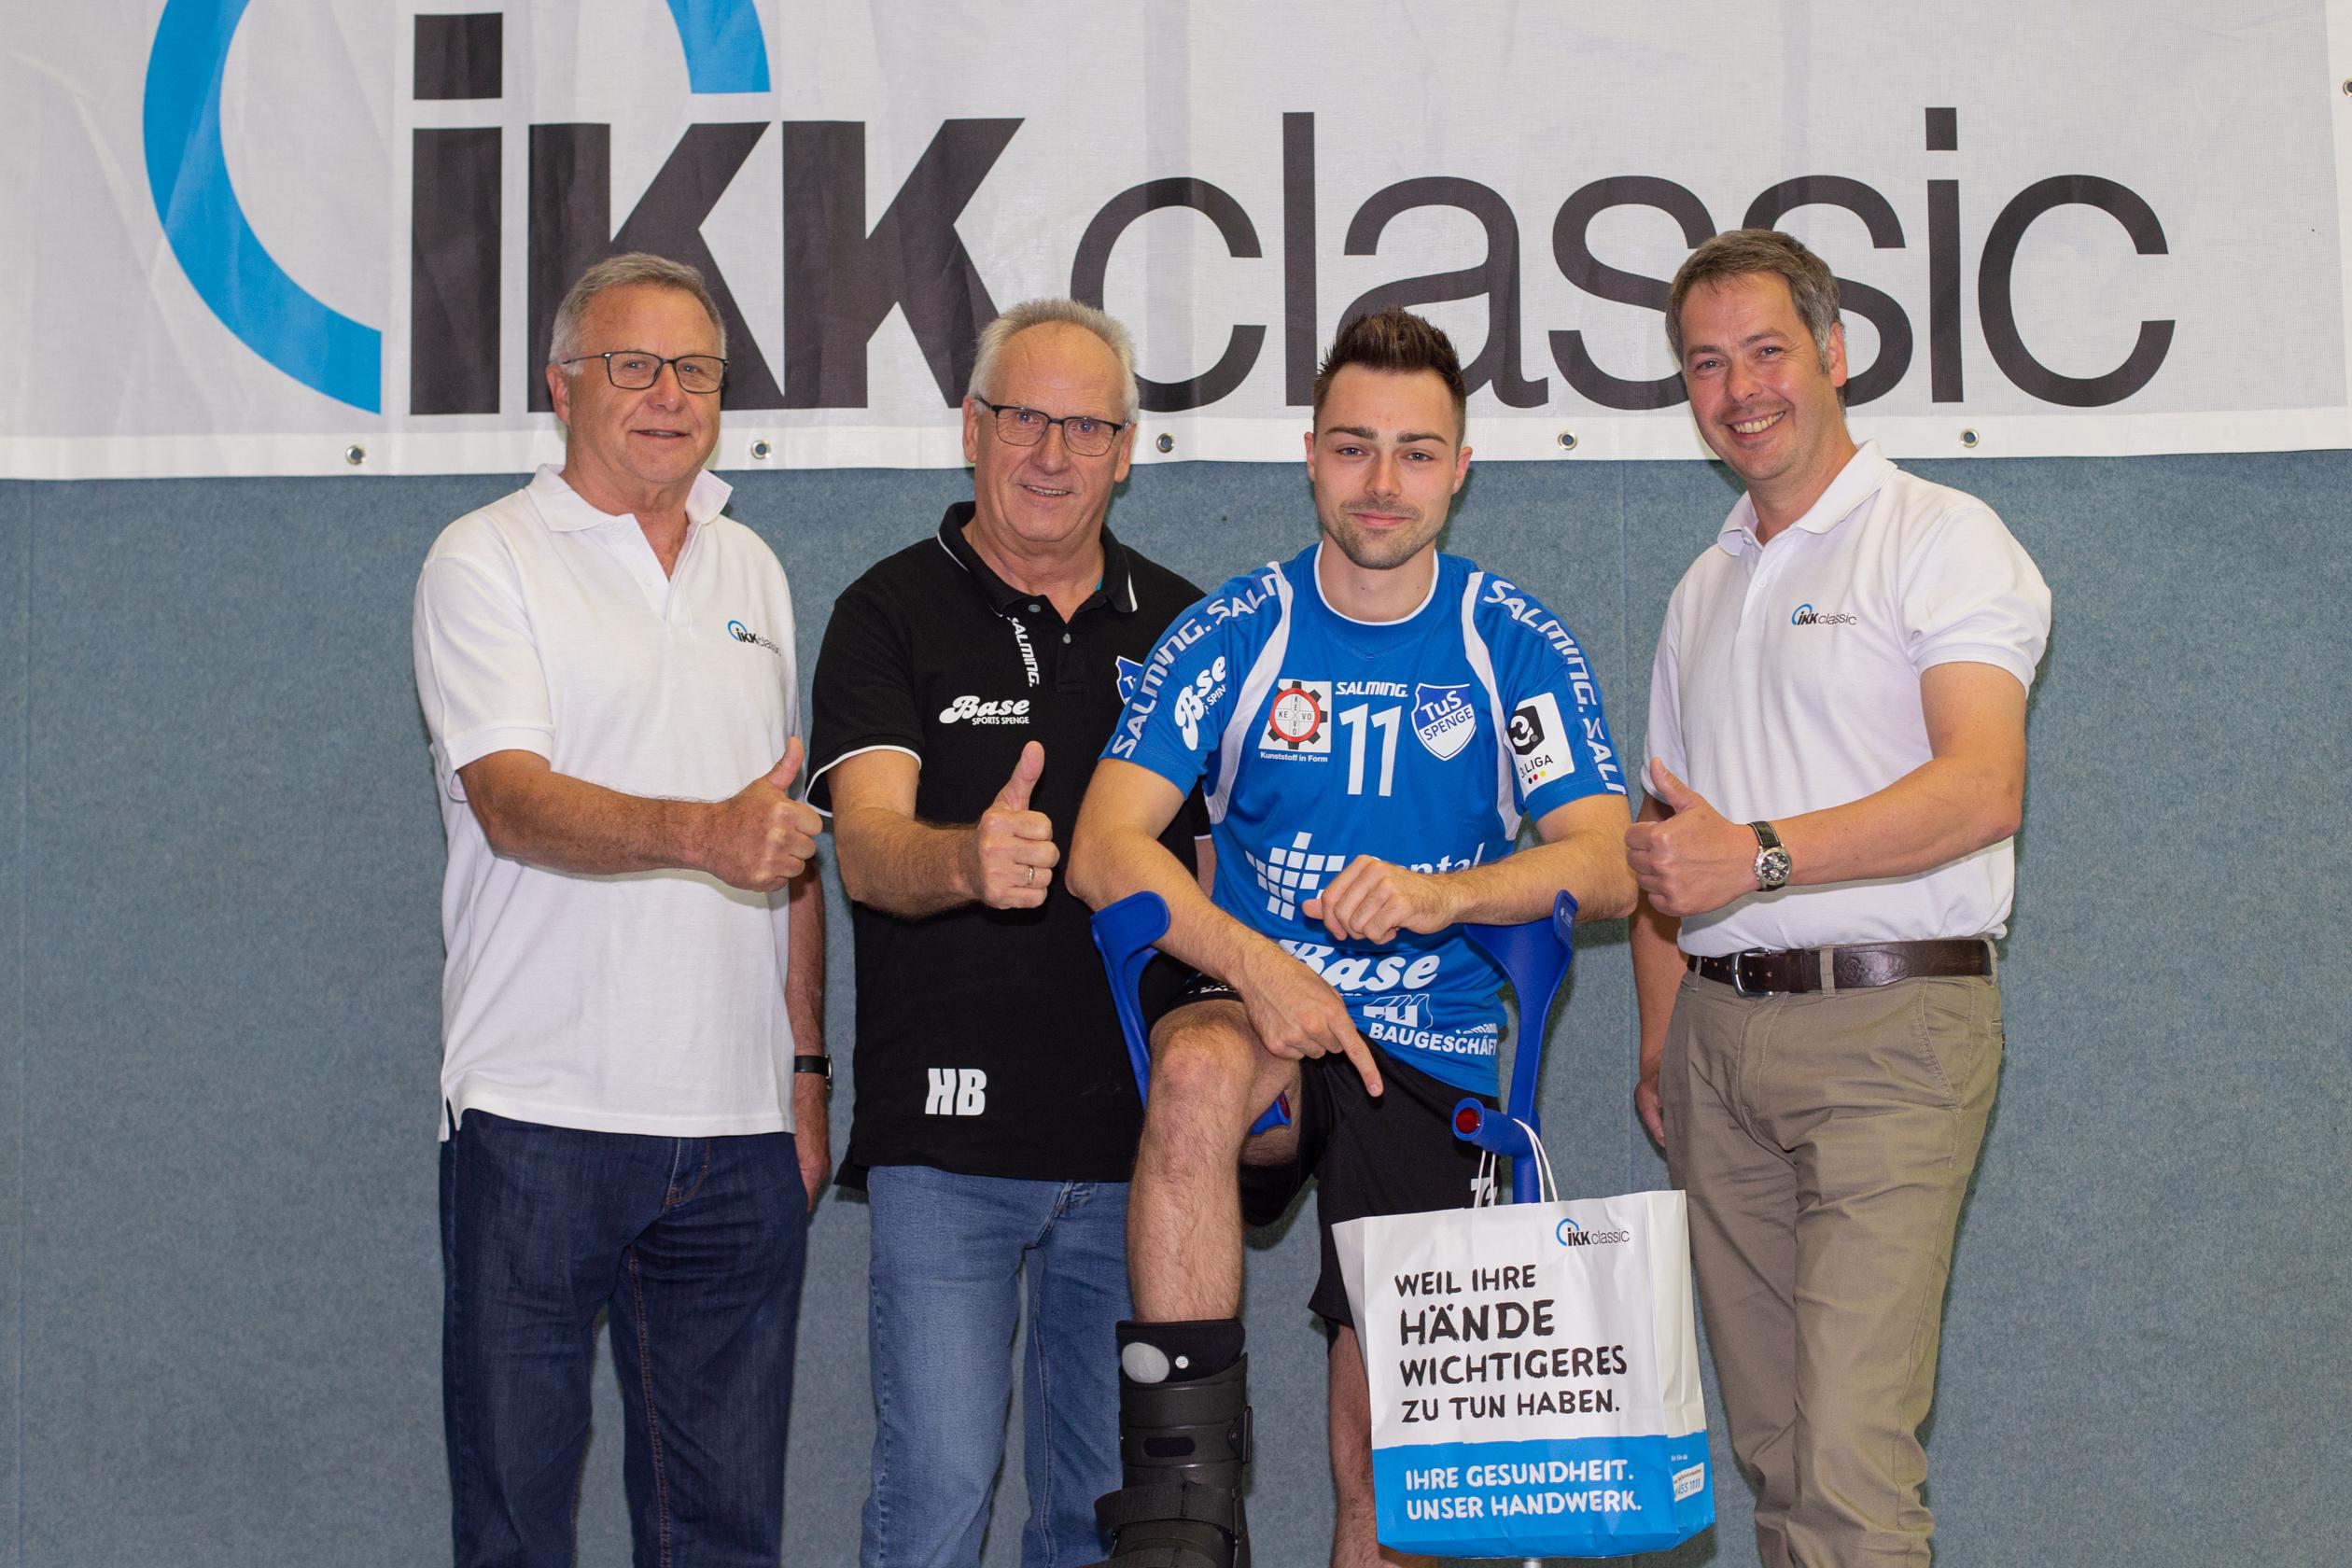 Die IKK classic verlängert Sponsorenvertrag